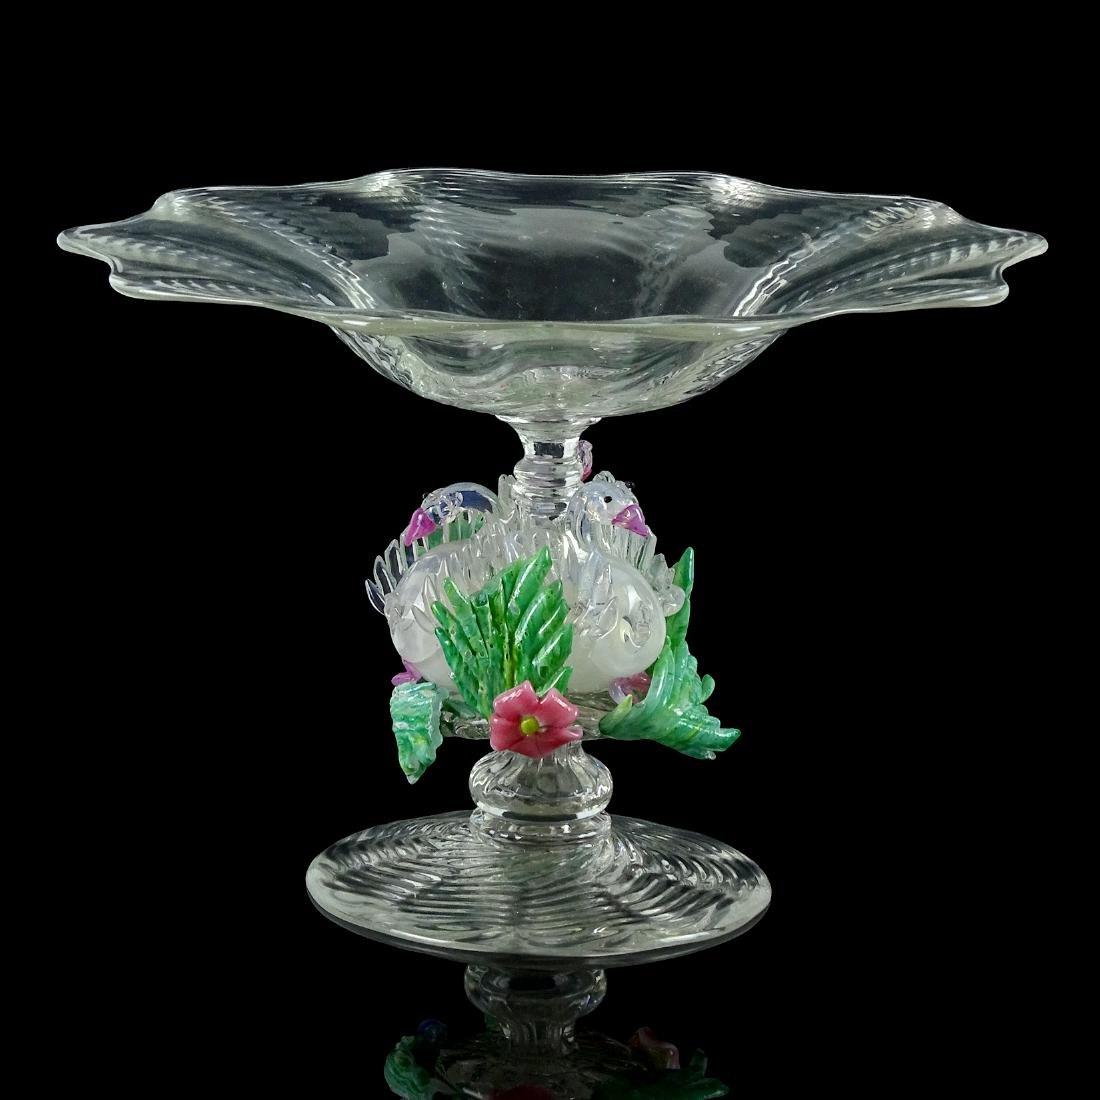 Salviati Venetian Opal Swans Art Glass Compote Bowl